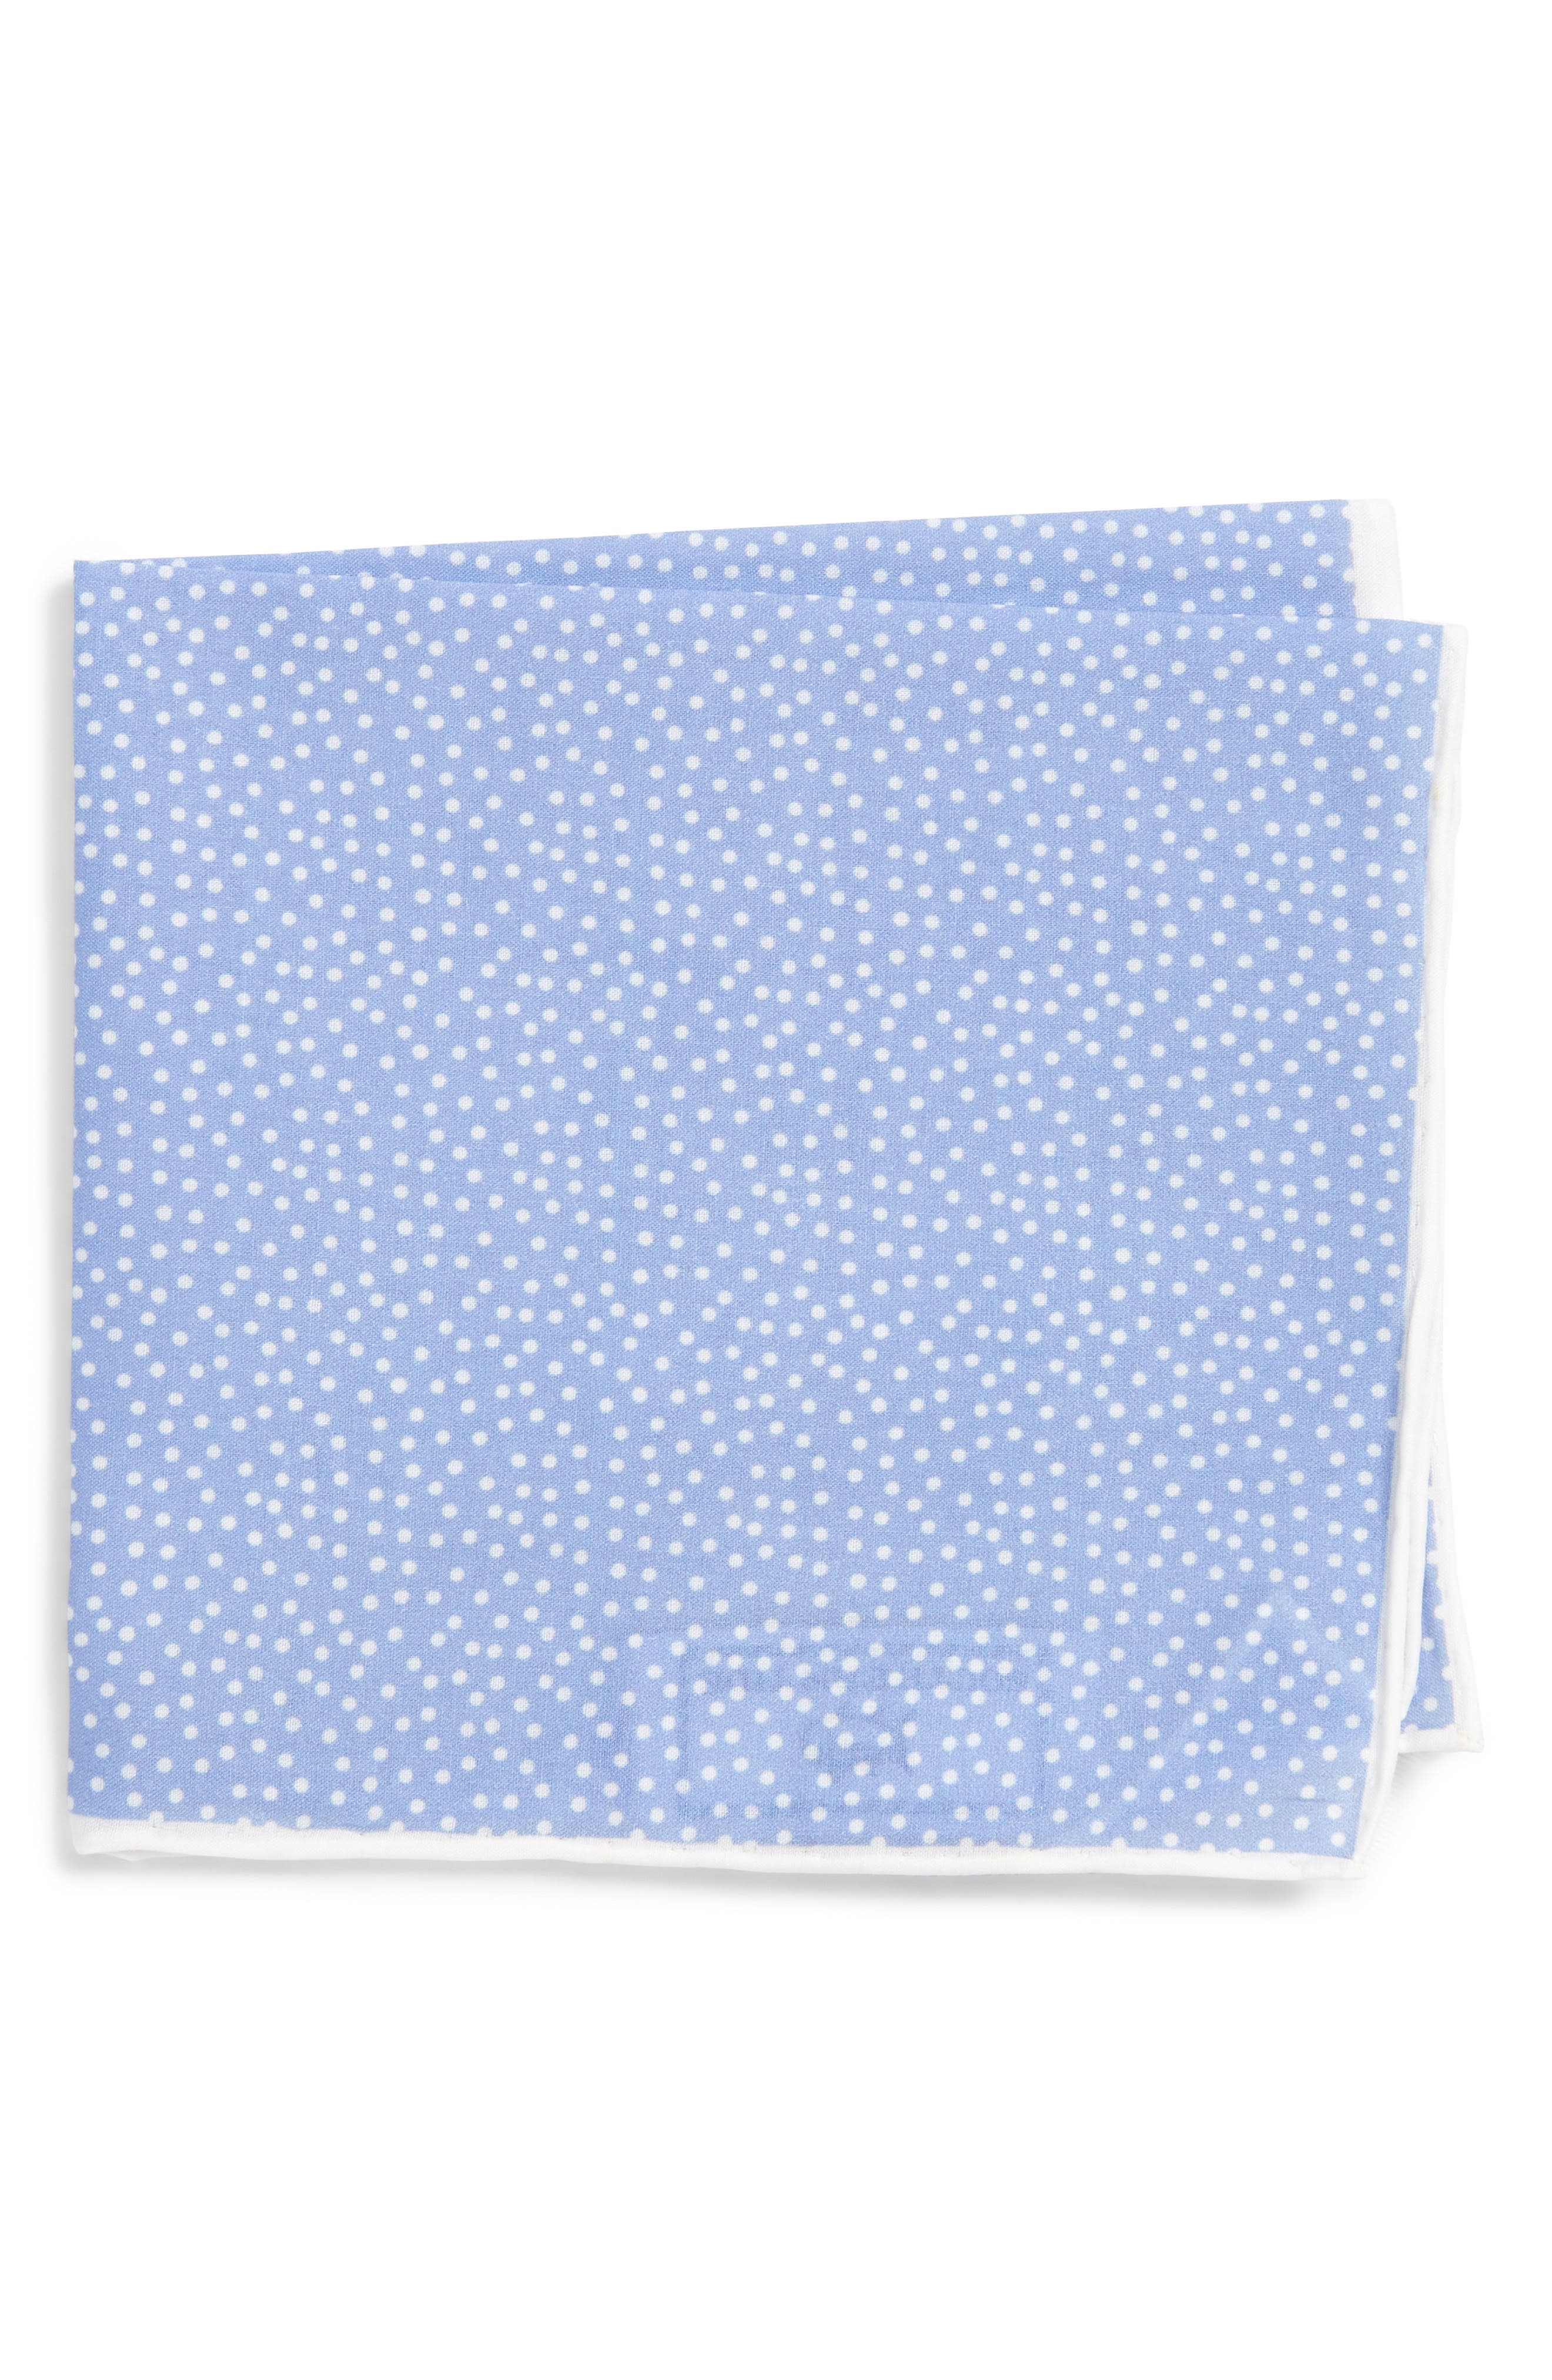 Sagamore Spots Cotton & Silk Pocket Square,                             Main thumbnail 1, color,                             Blue